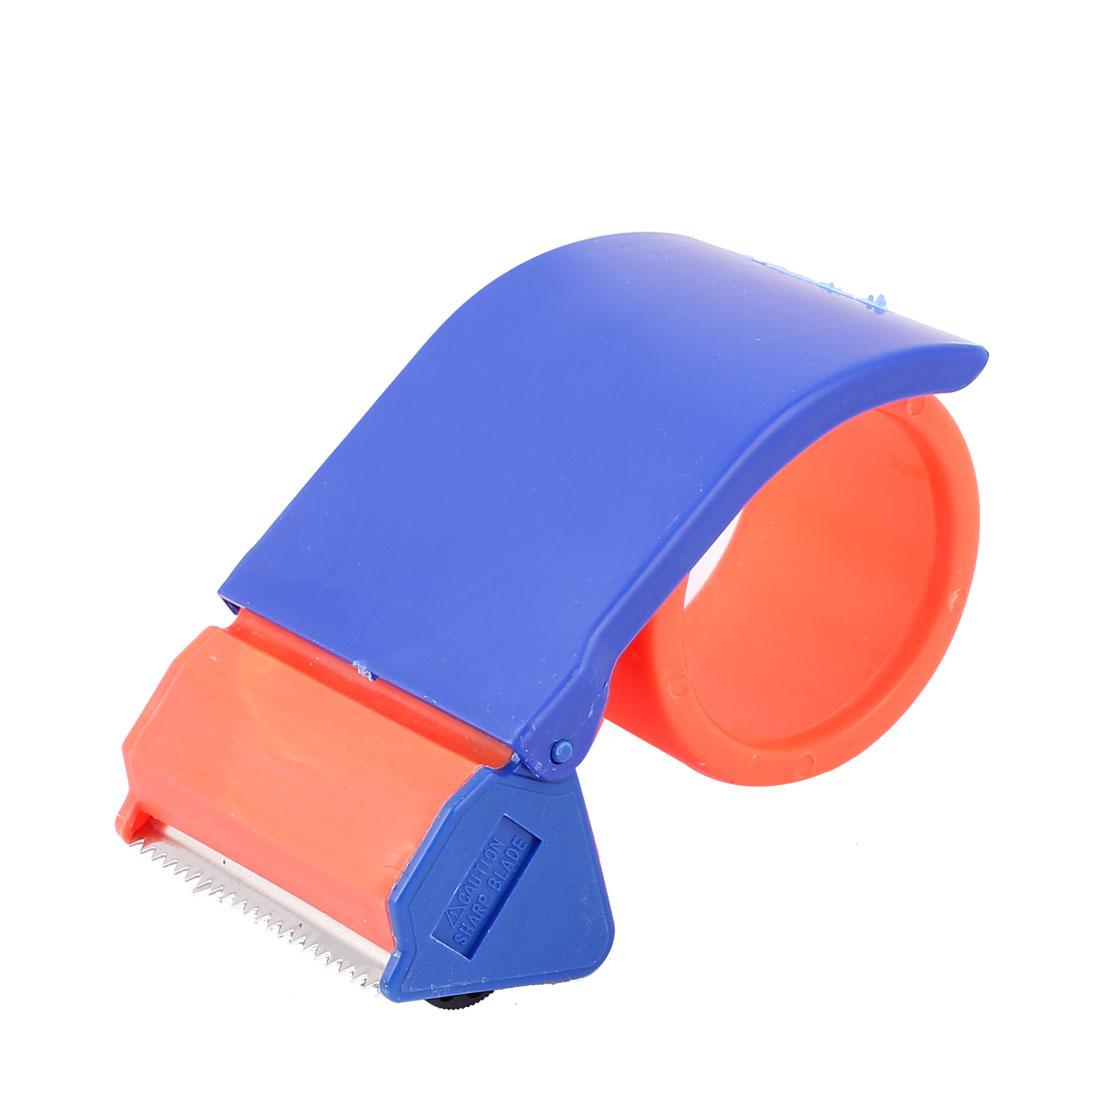 "Packing Plastic Roller 2.5"" Width Tape Cutter Dispenser Blue Orange"